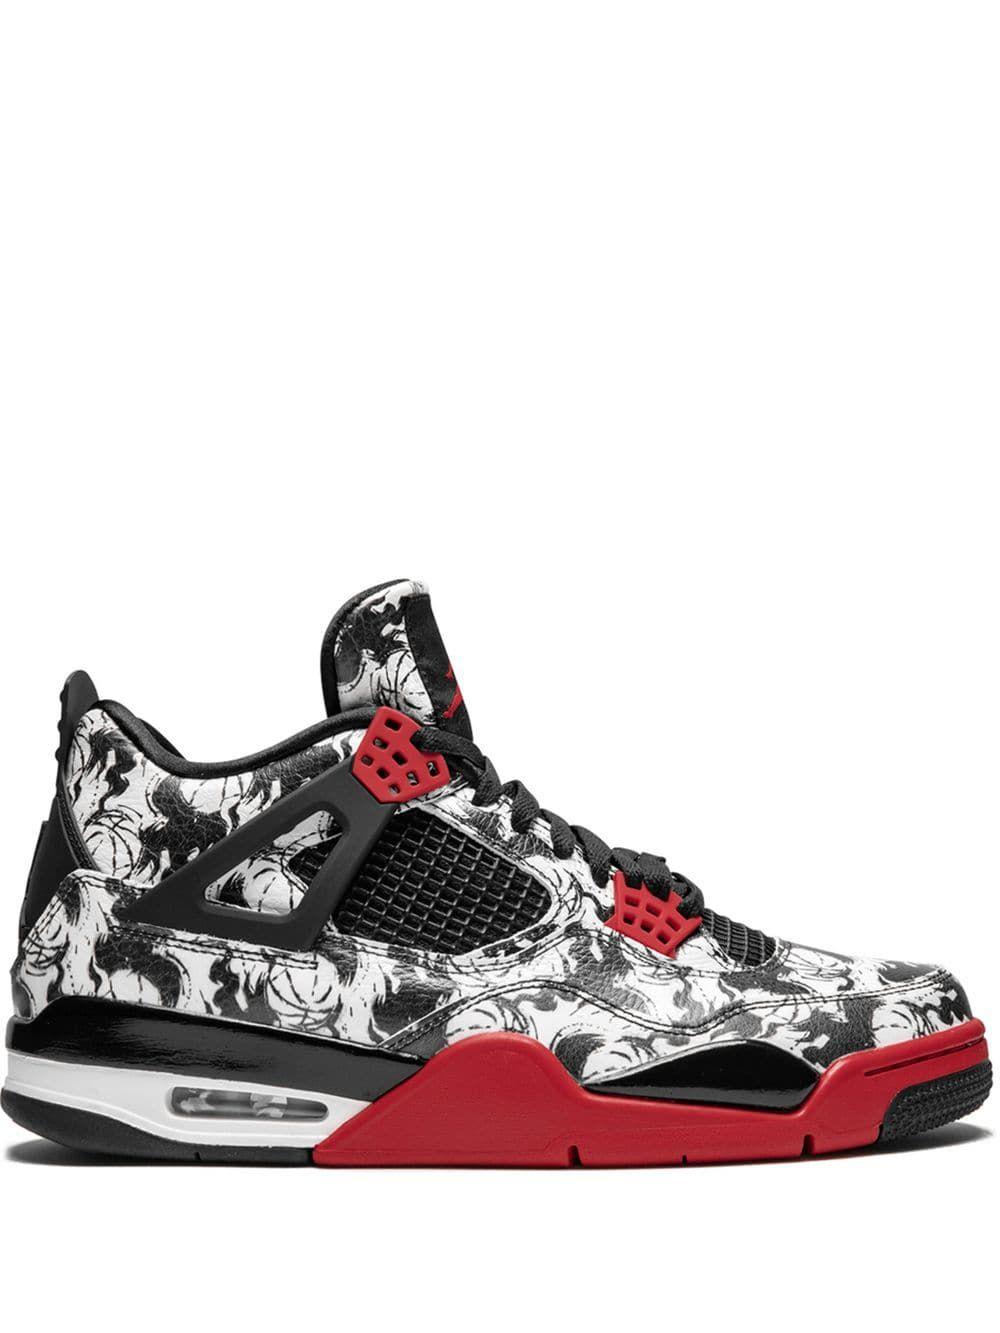 a58f93845ae5 JORDAN JORDAN AIR JORDAN 4 RETRO SNGL DY SNEAKERS - SCHWARZ.  jordan  shoes